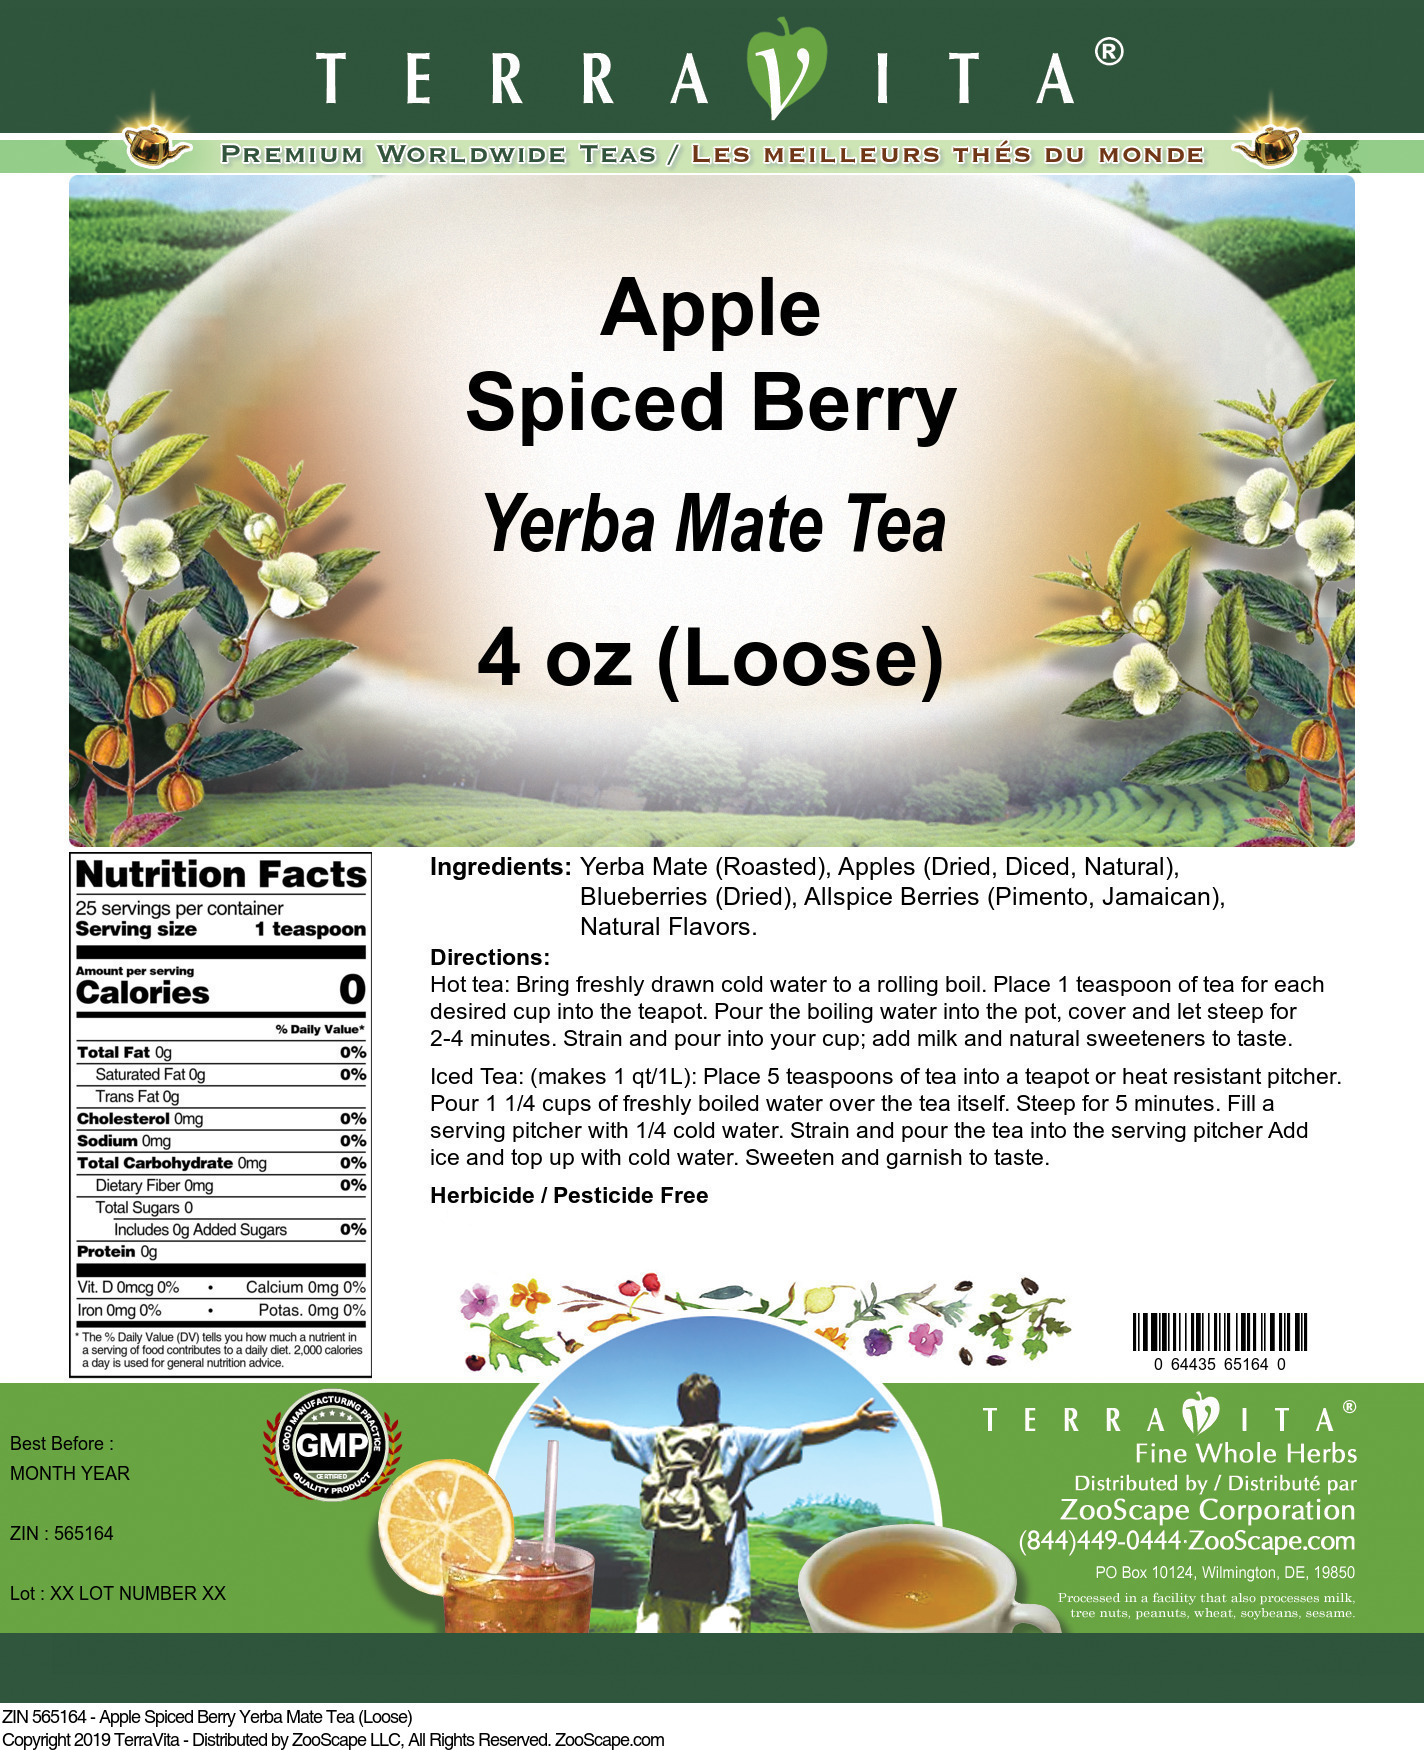 Apple Spiced Berry Yerba Mate Tea (Loose)